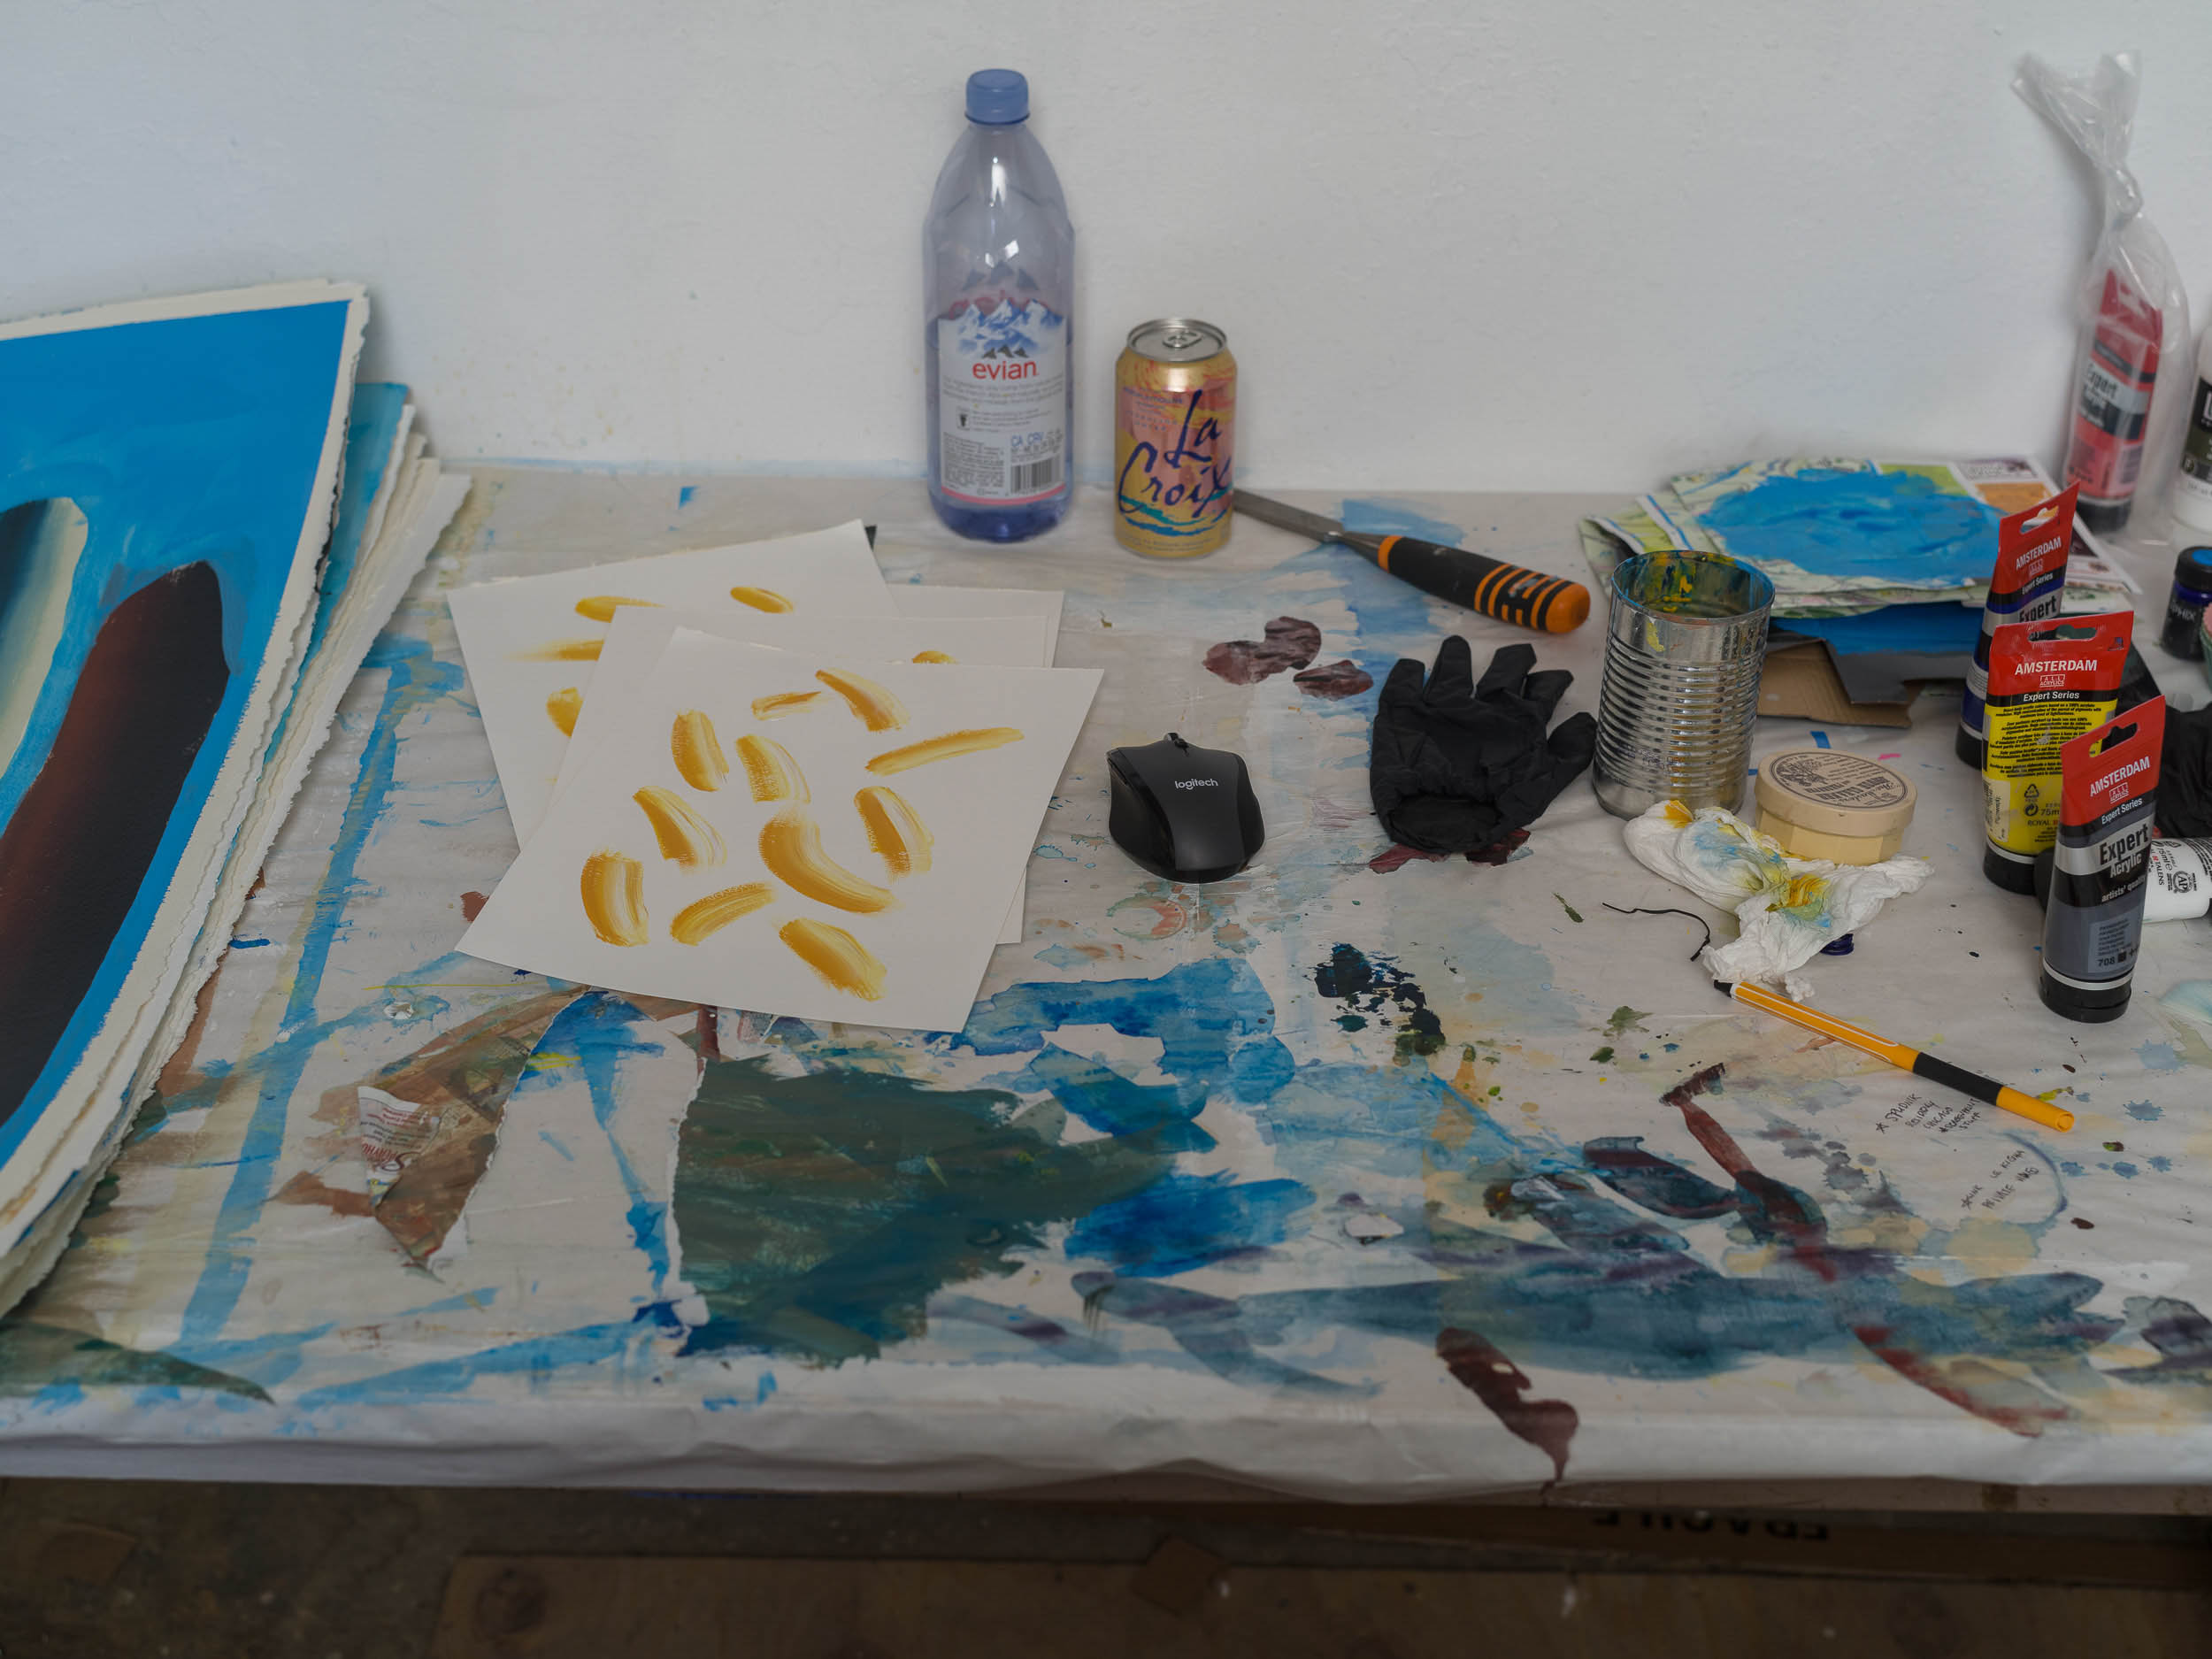 wassaic-project-artist-jesse-walton-2019-01-29-13-49-33.jpg